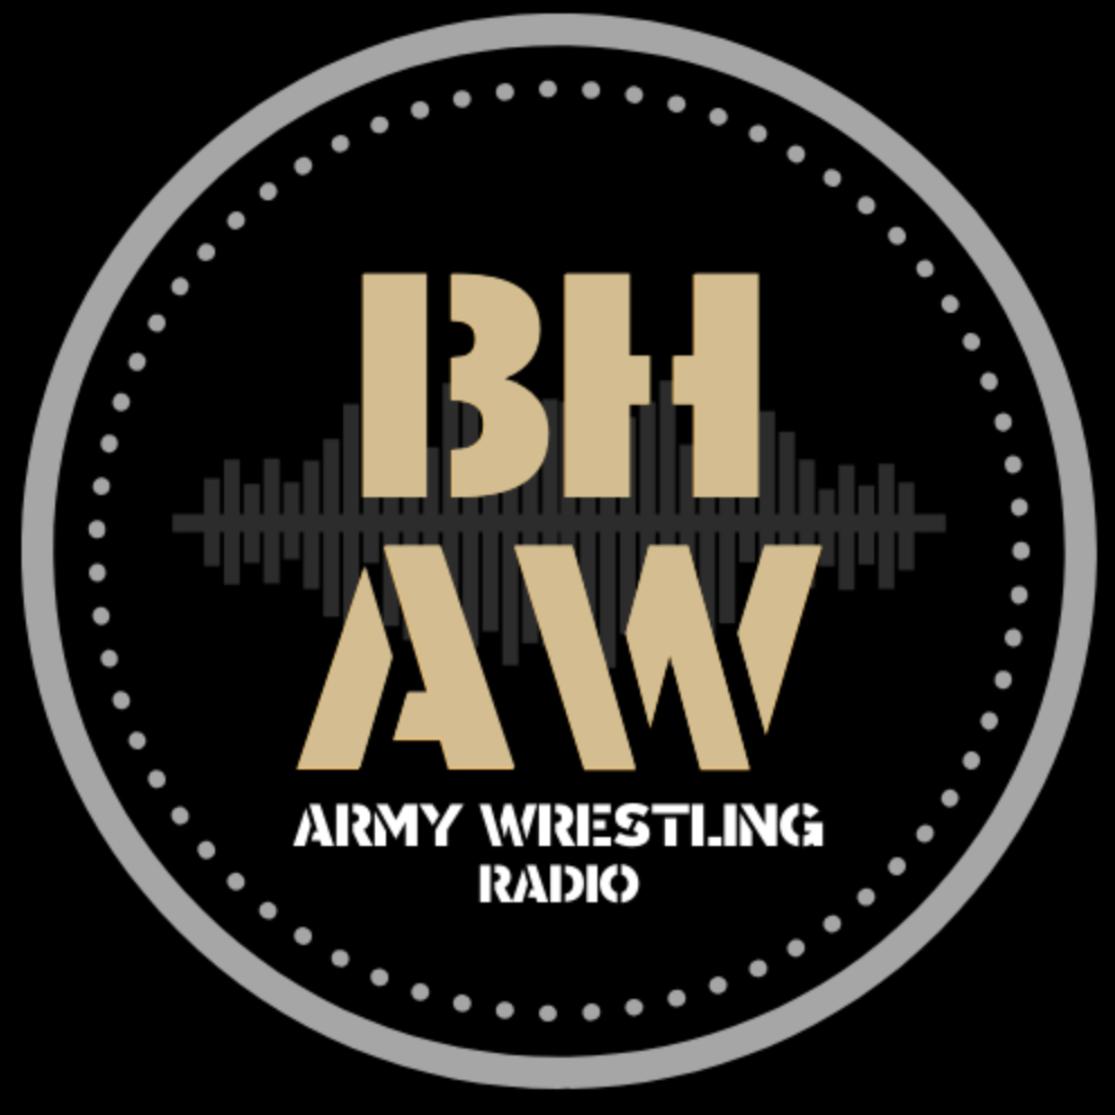 @BhawRadio Profile Image   Linktree